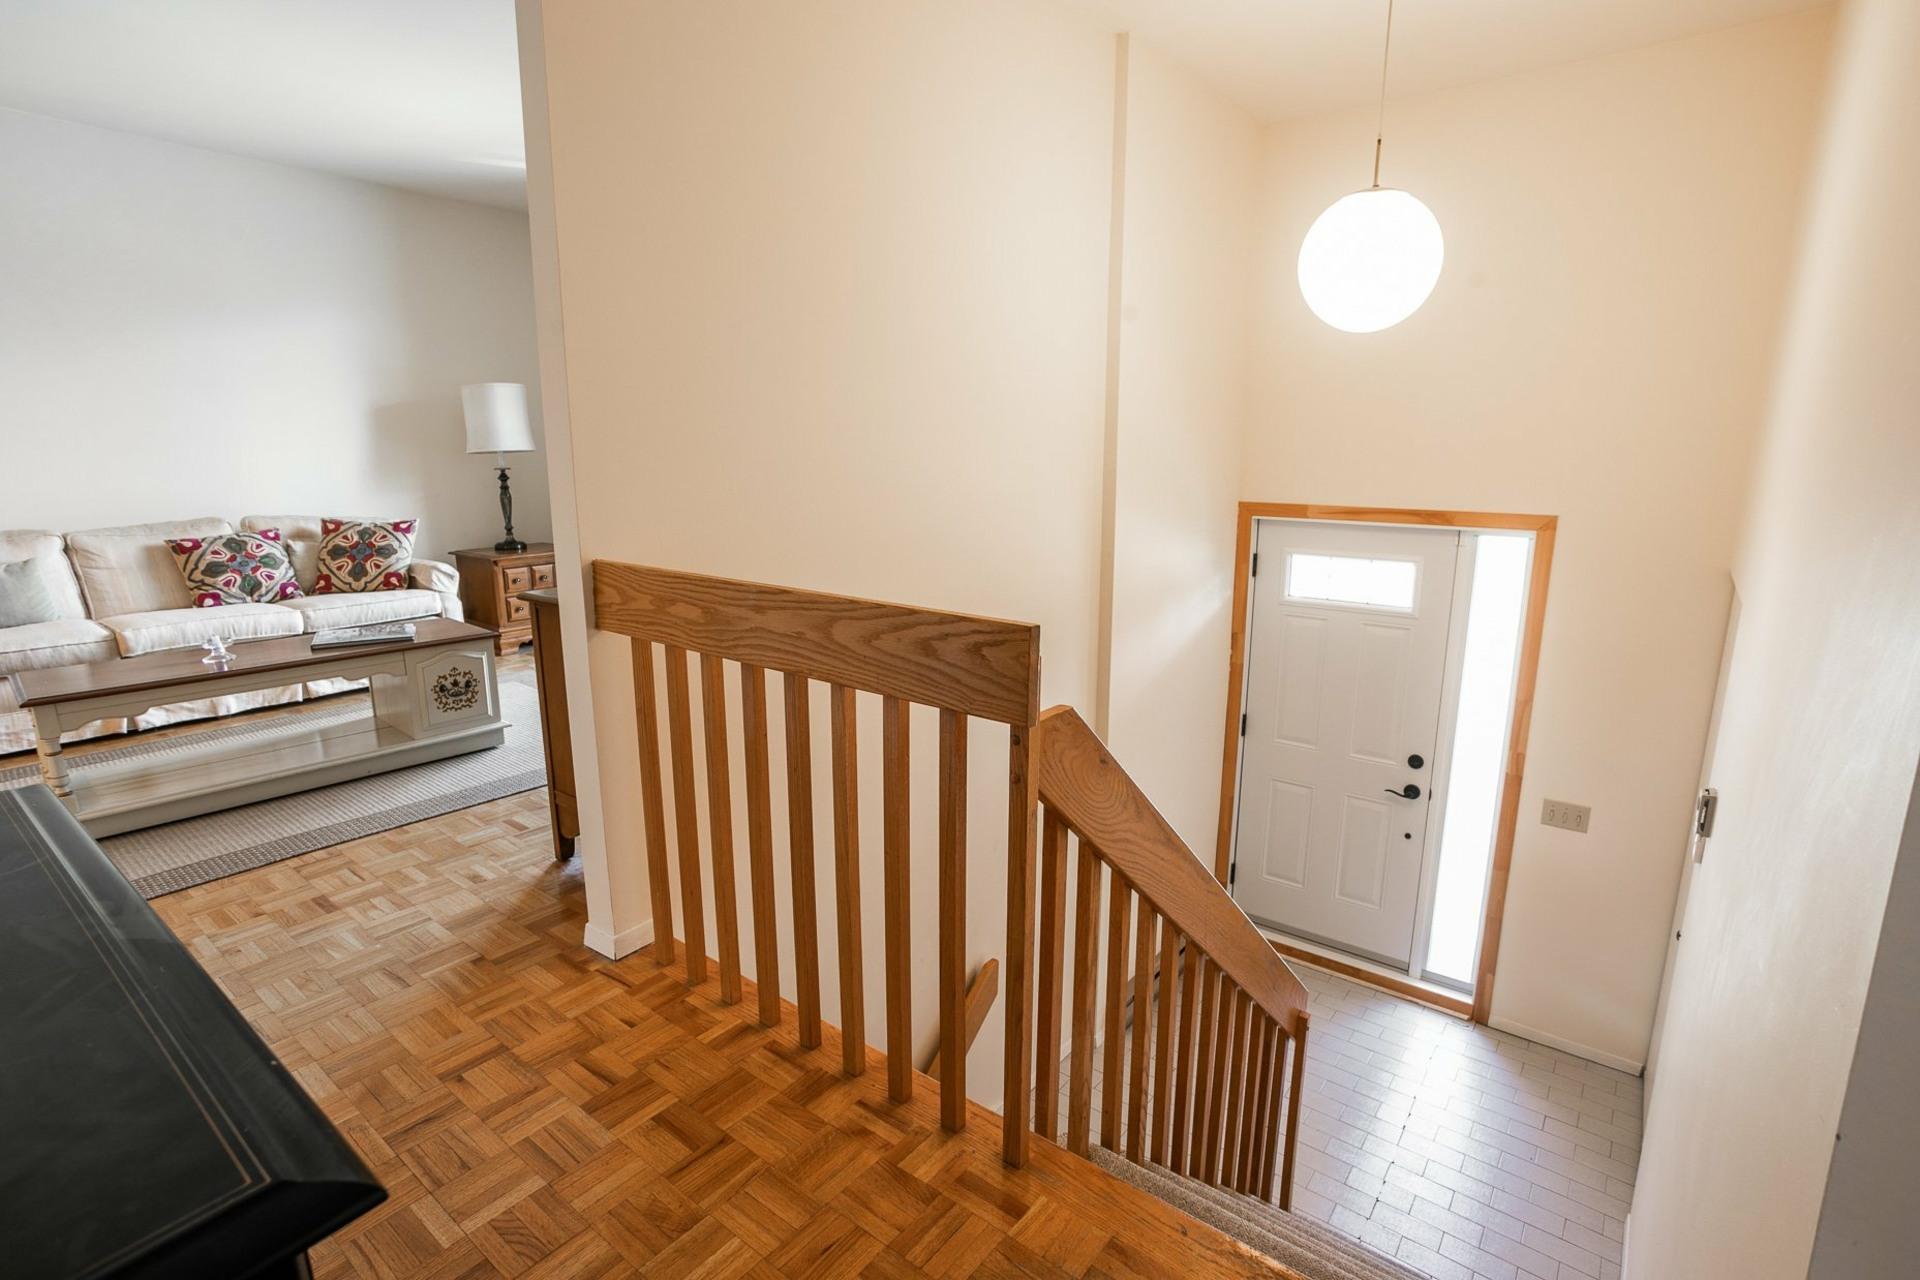 image 13 - House For sale Pierrefonds-Roxboro Montréal  - 8 rooms